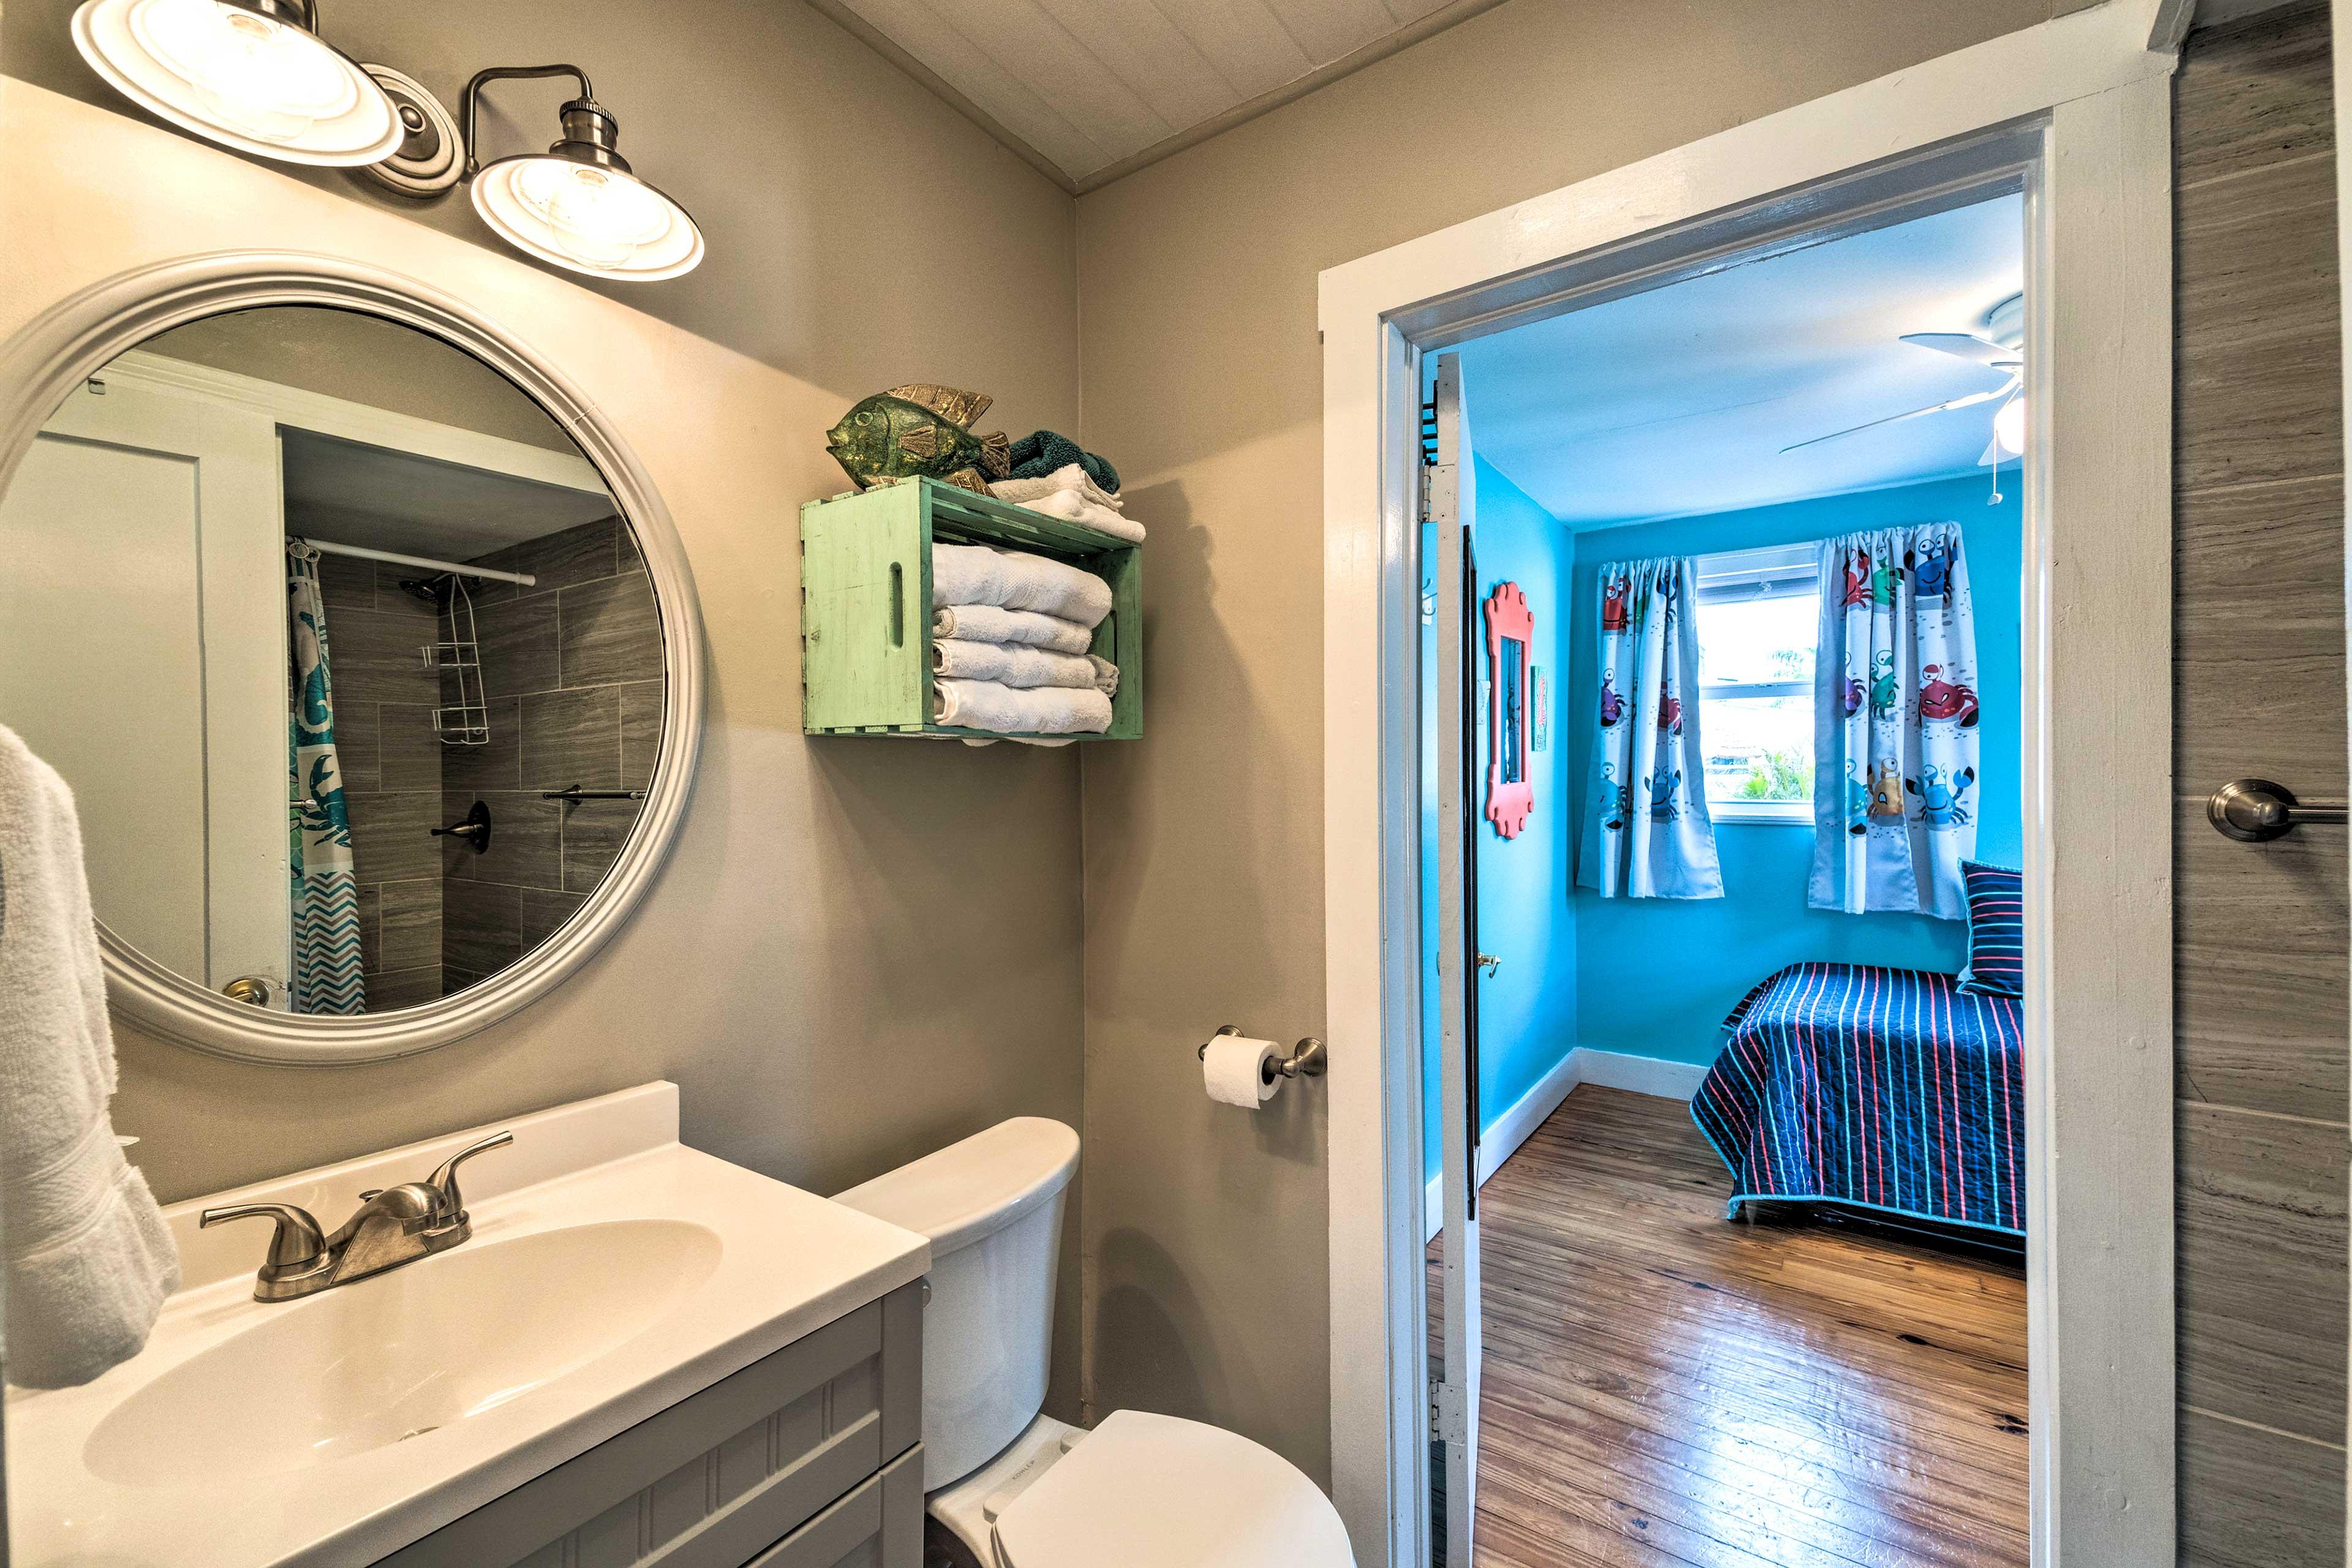 Freshen up in the shared en-suite bathroom.